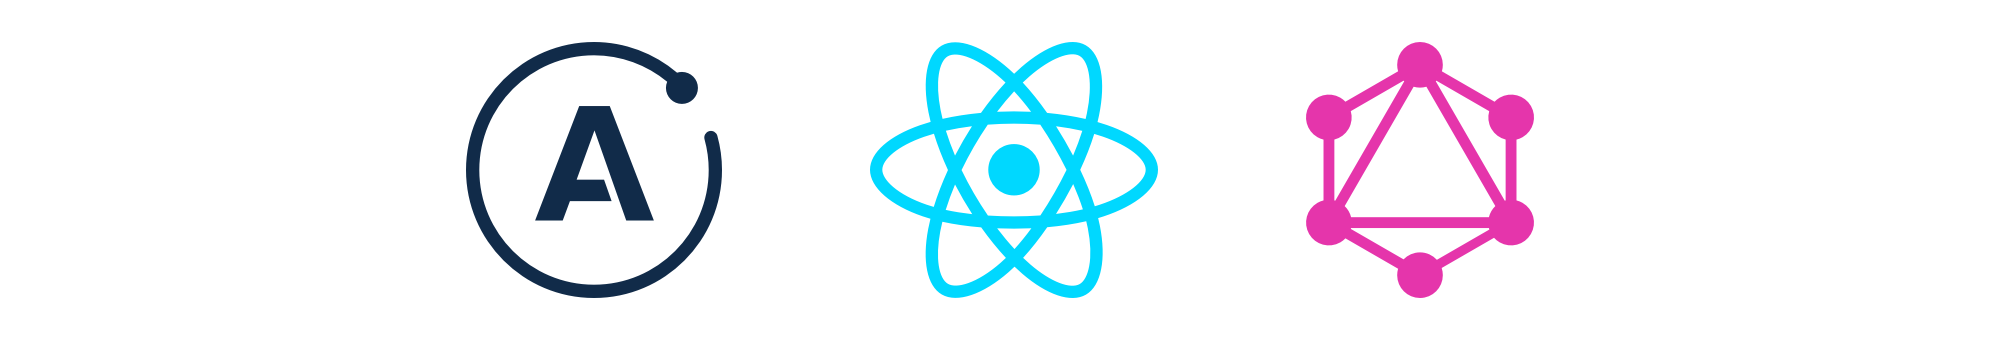 GitHub - graphql-boilerplates/react-fullstack-graphql: Starter